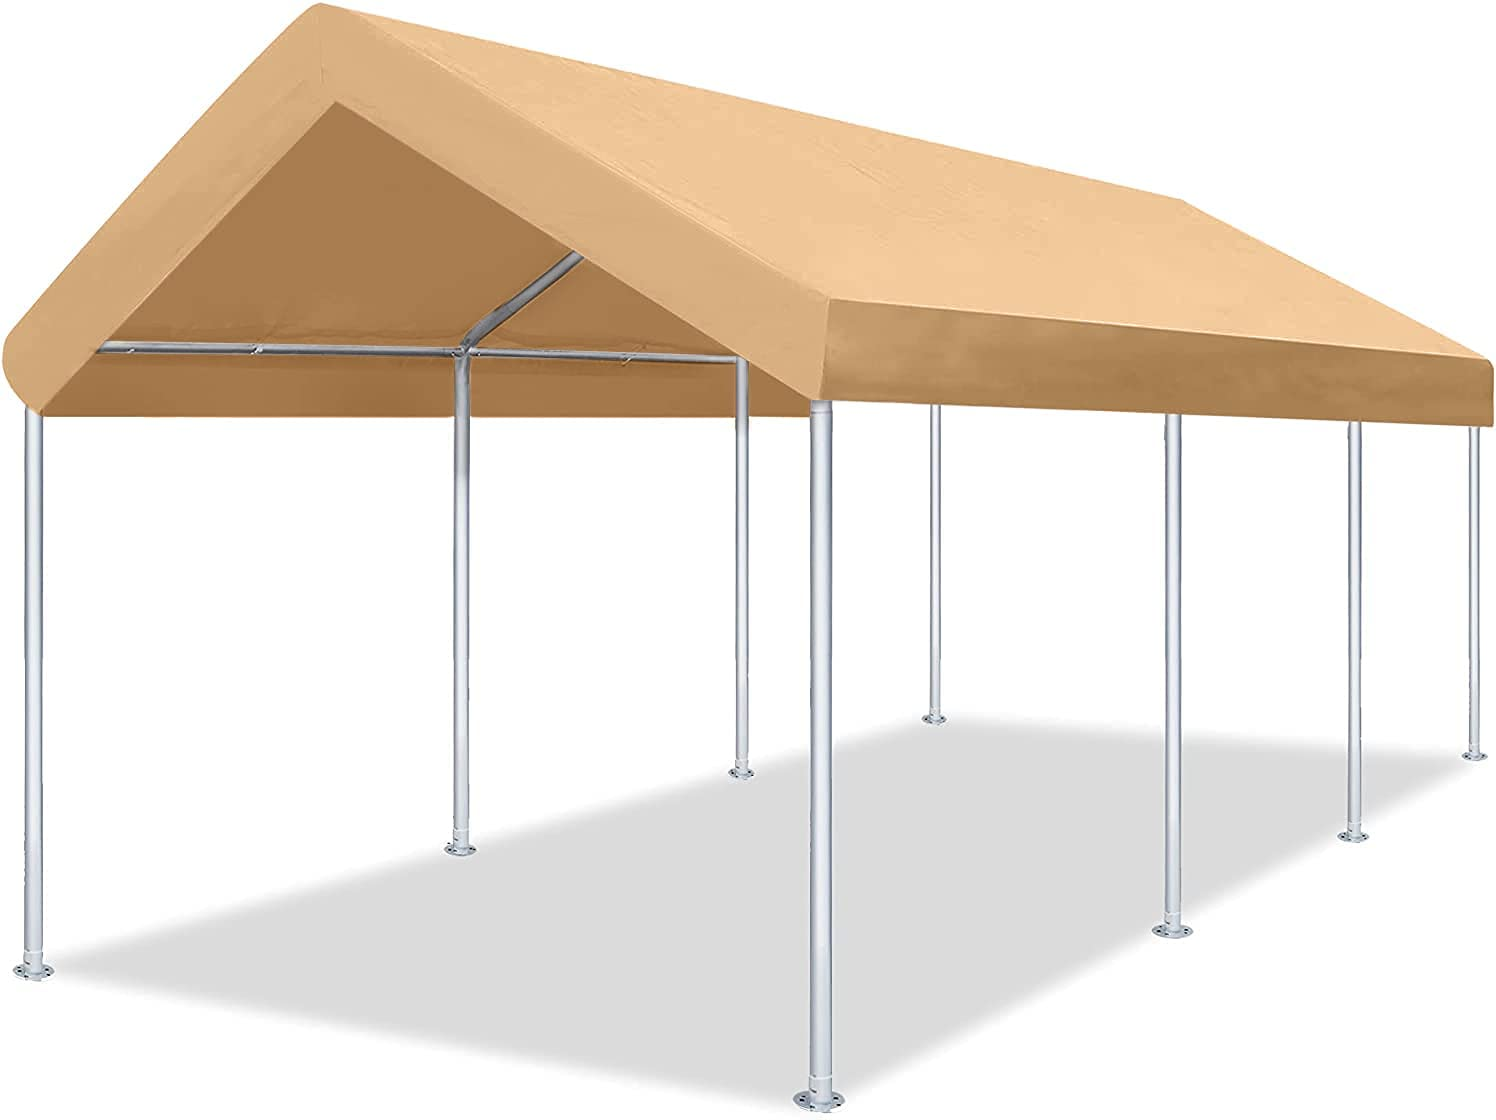 Washington Mall DOIFUN 12x20 Directly managed store Feet Heavy Duty Portable Garage Carport Car Canopy